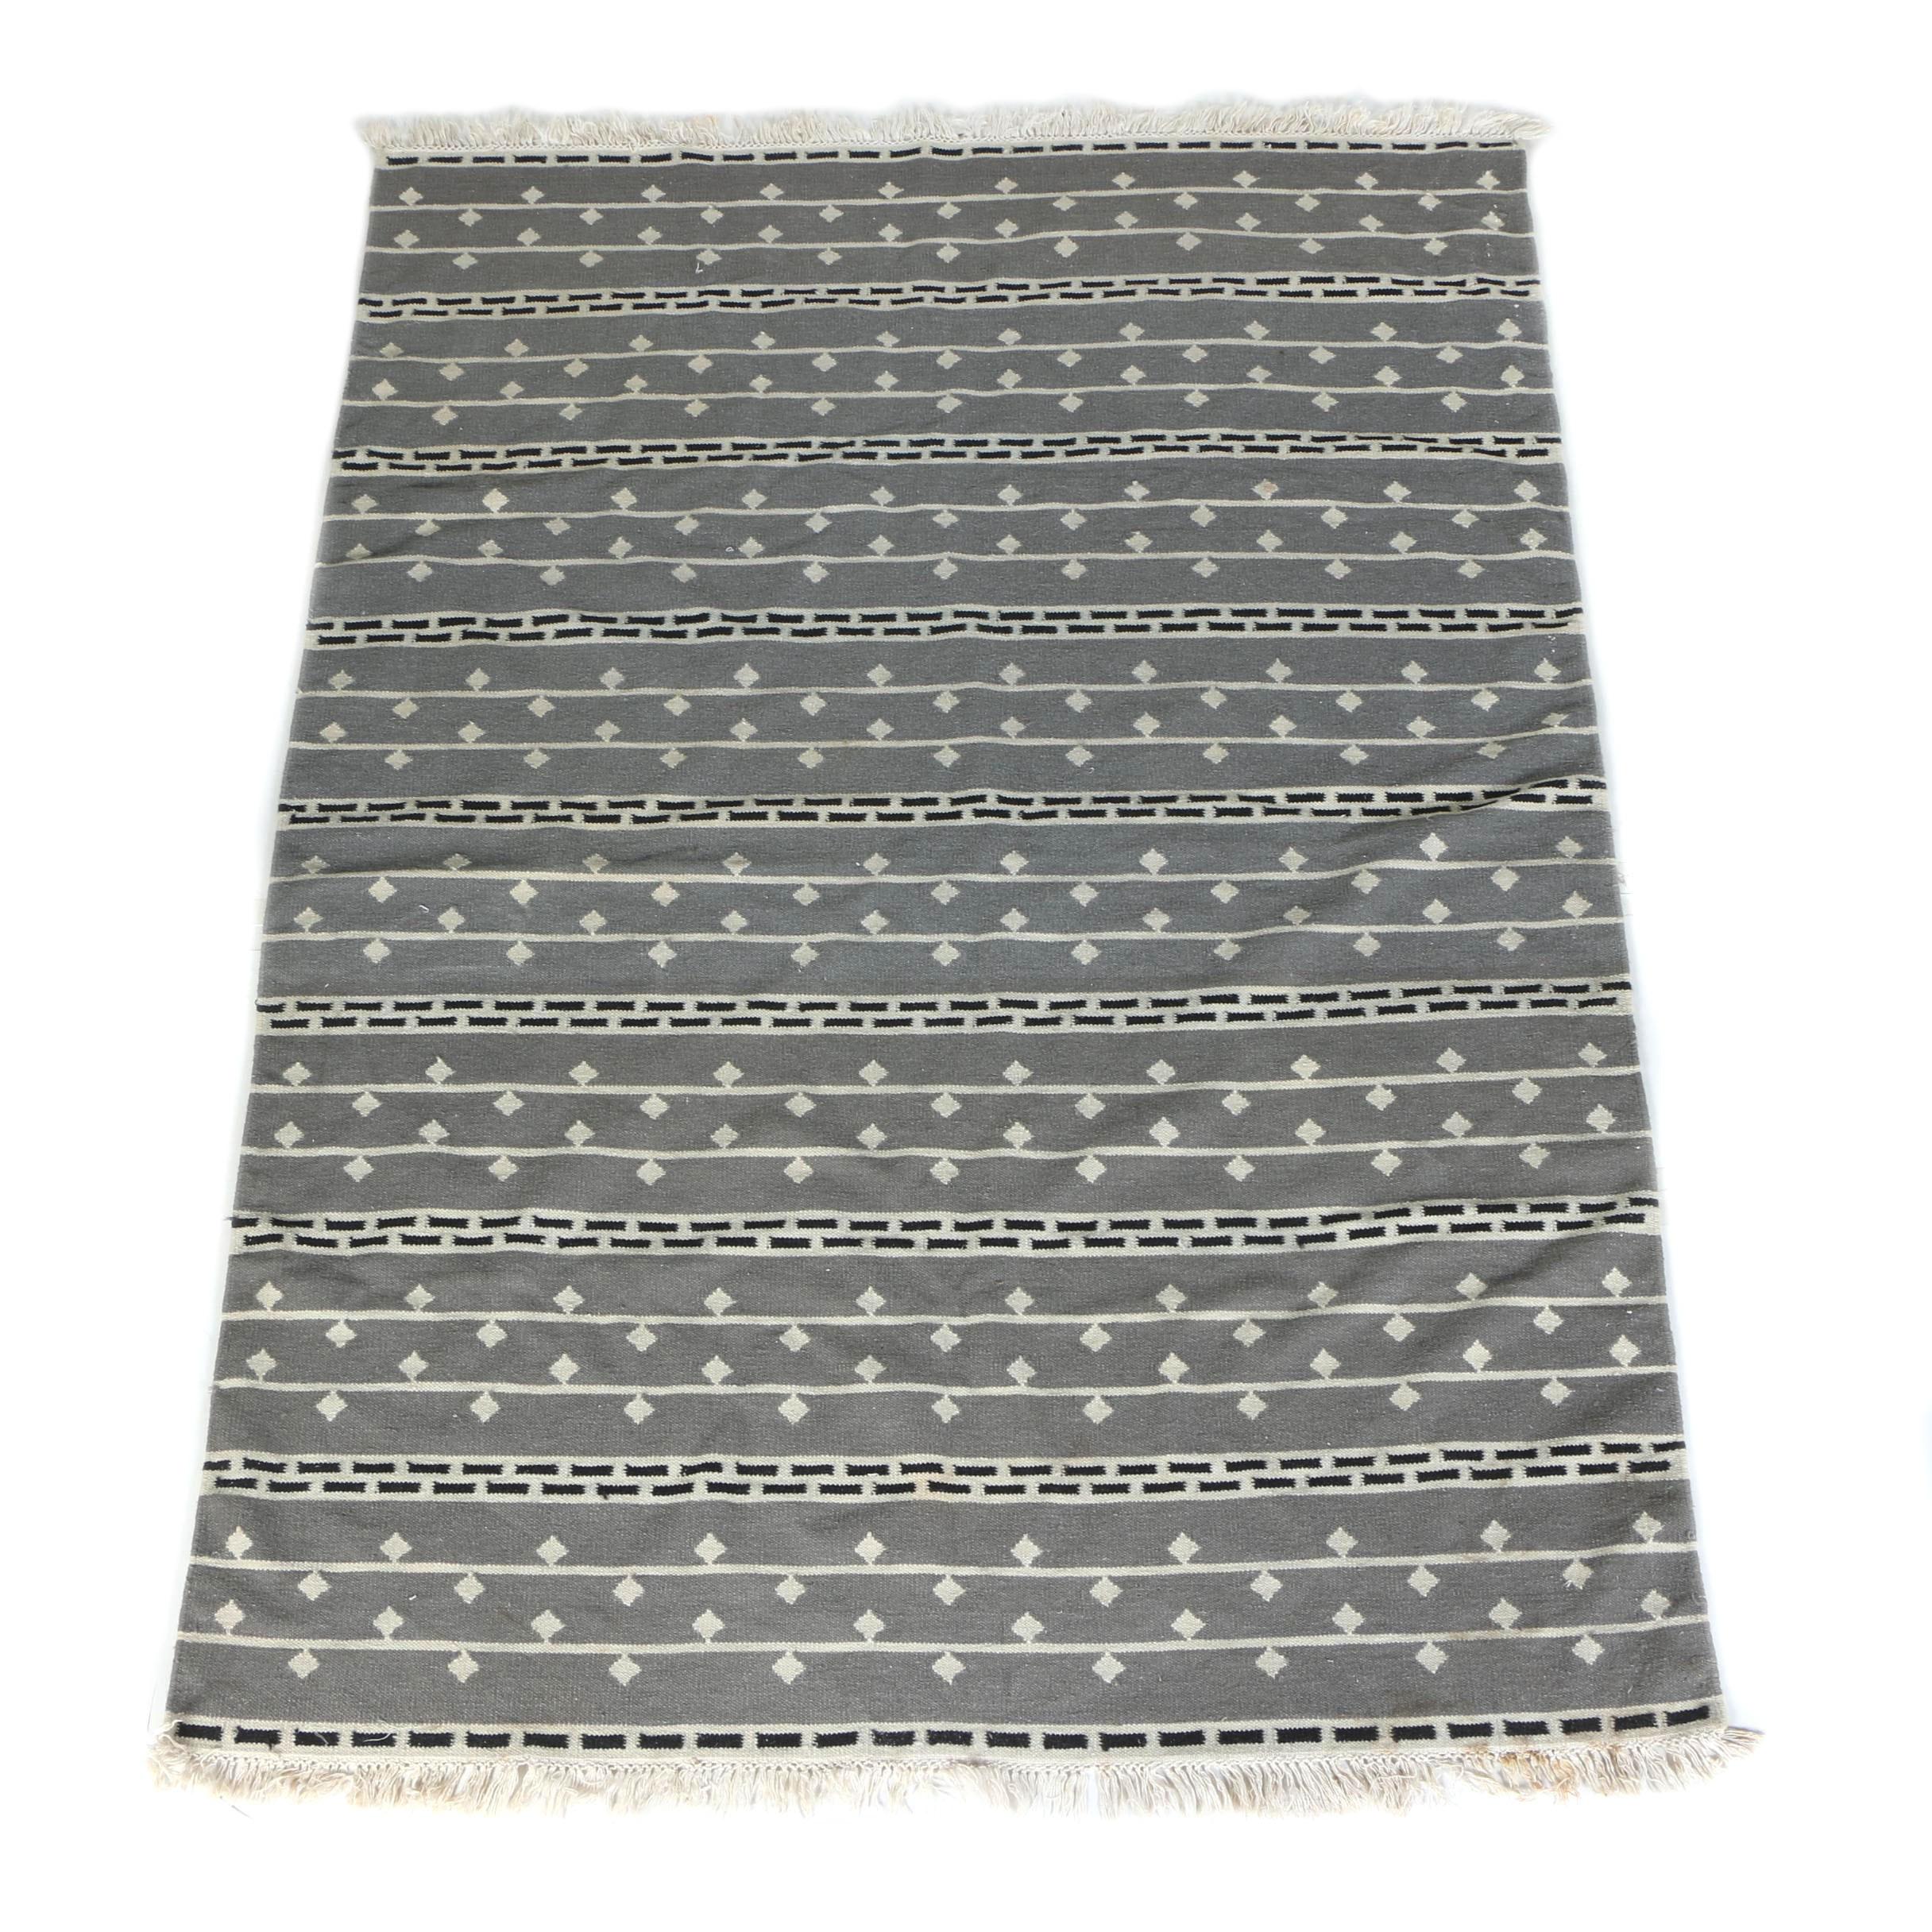 Knit Geometrical Blanket